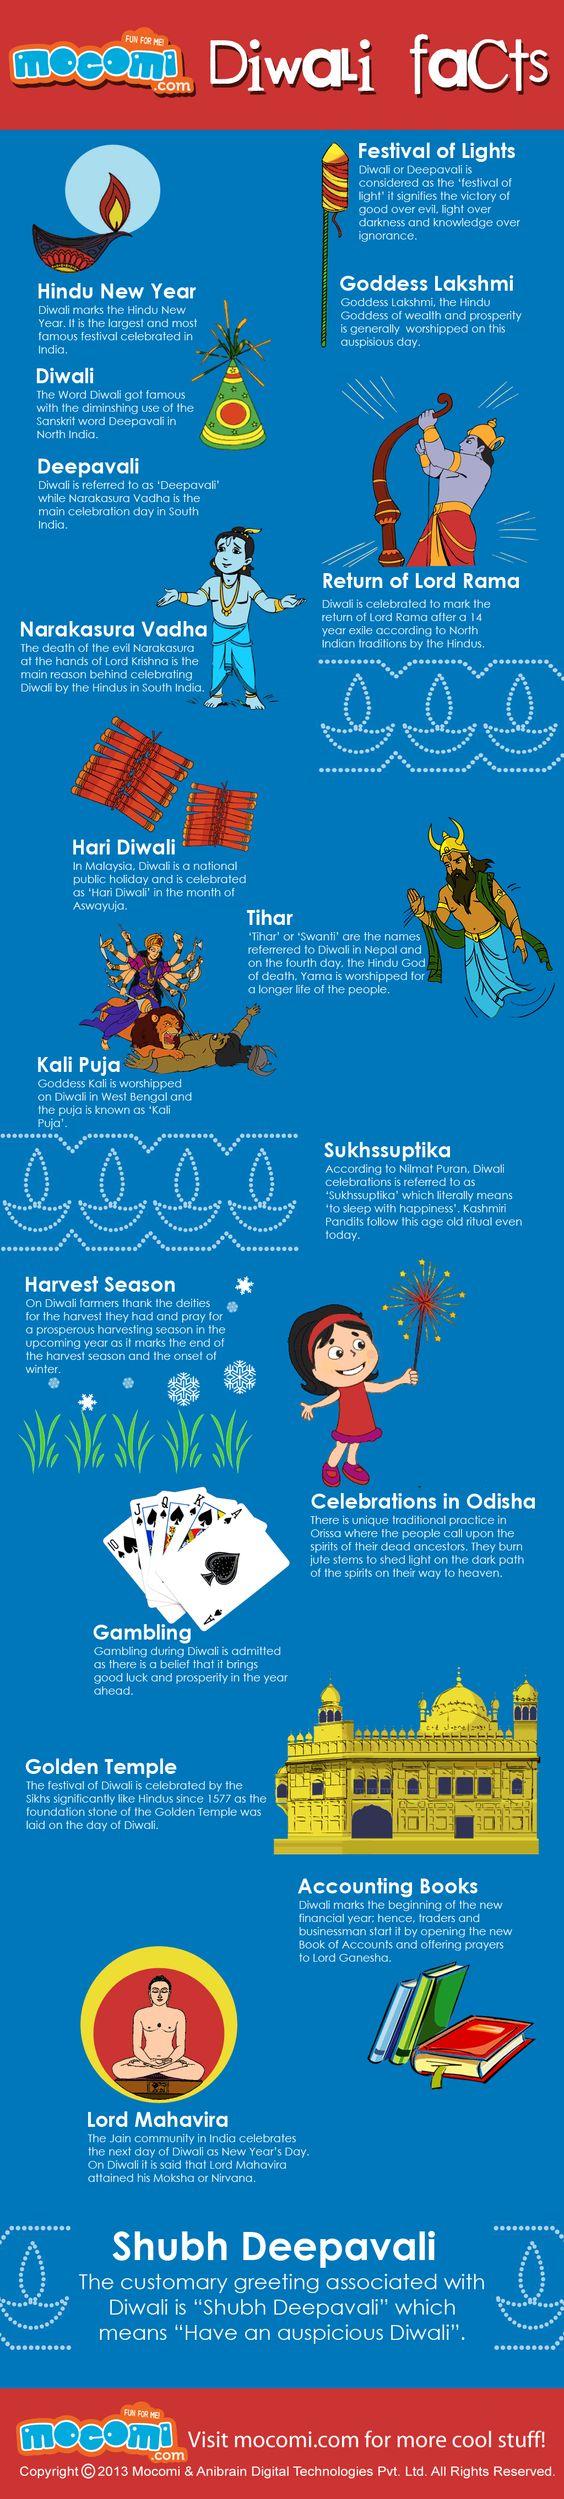 Diwali Facts